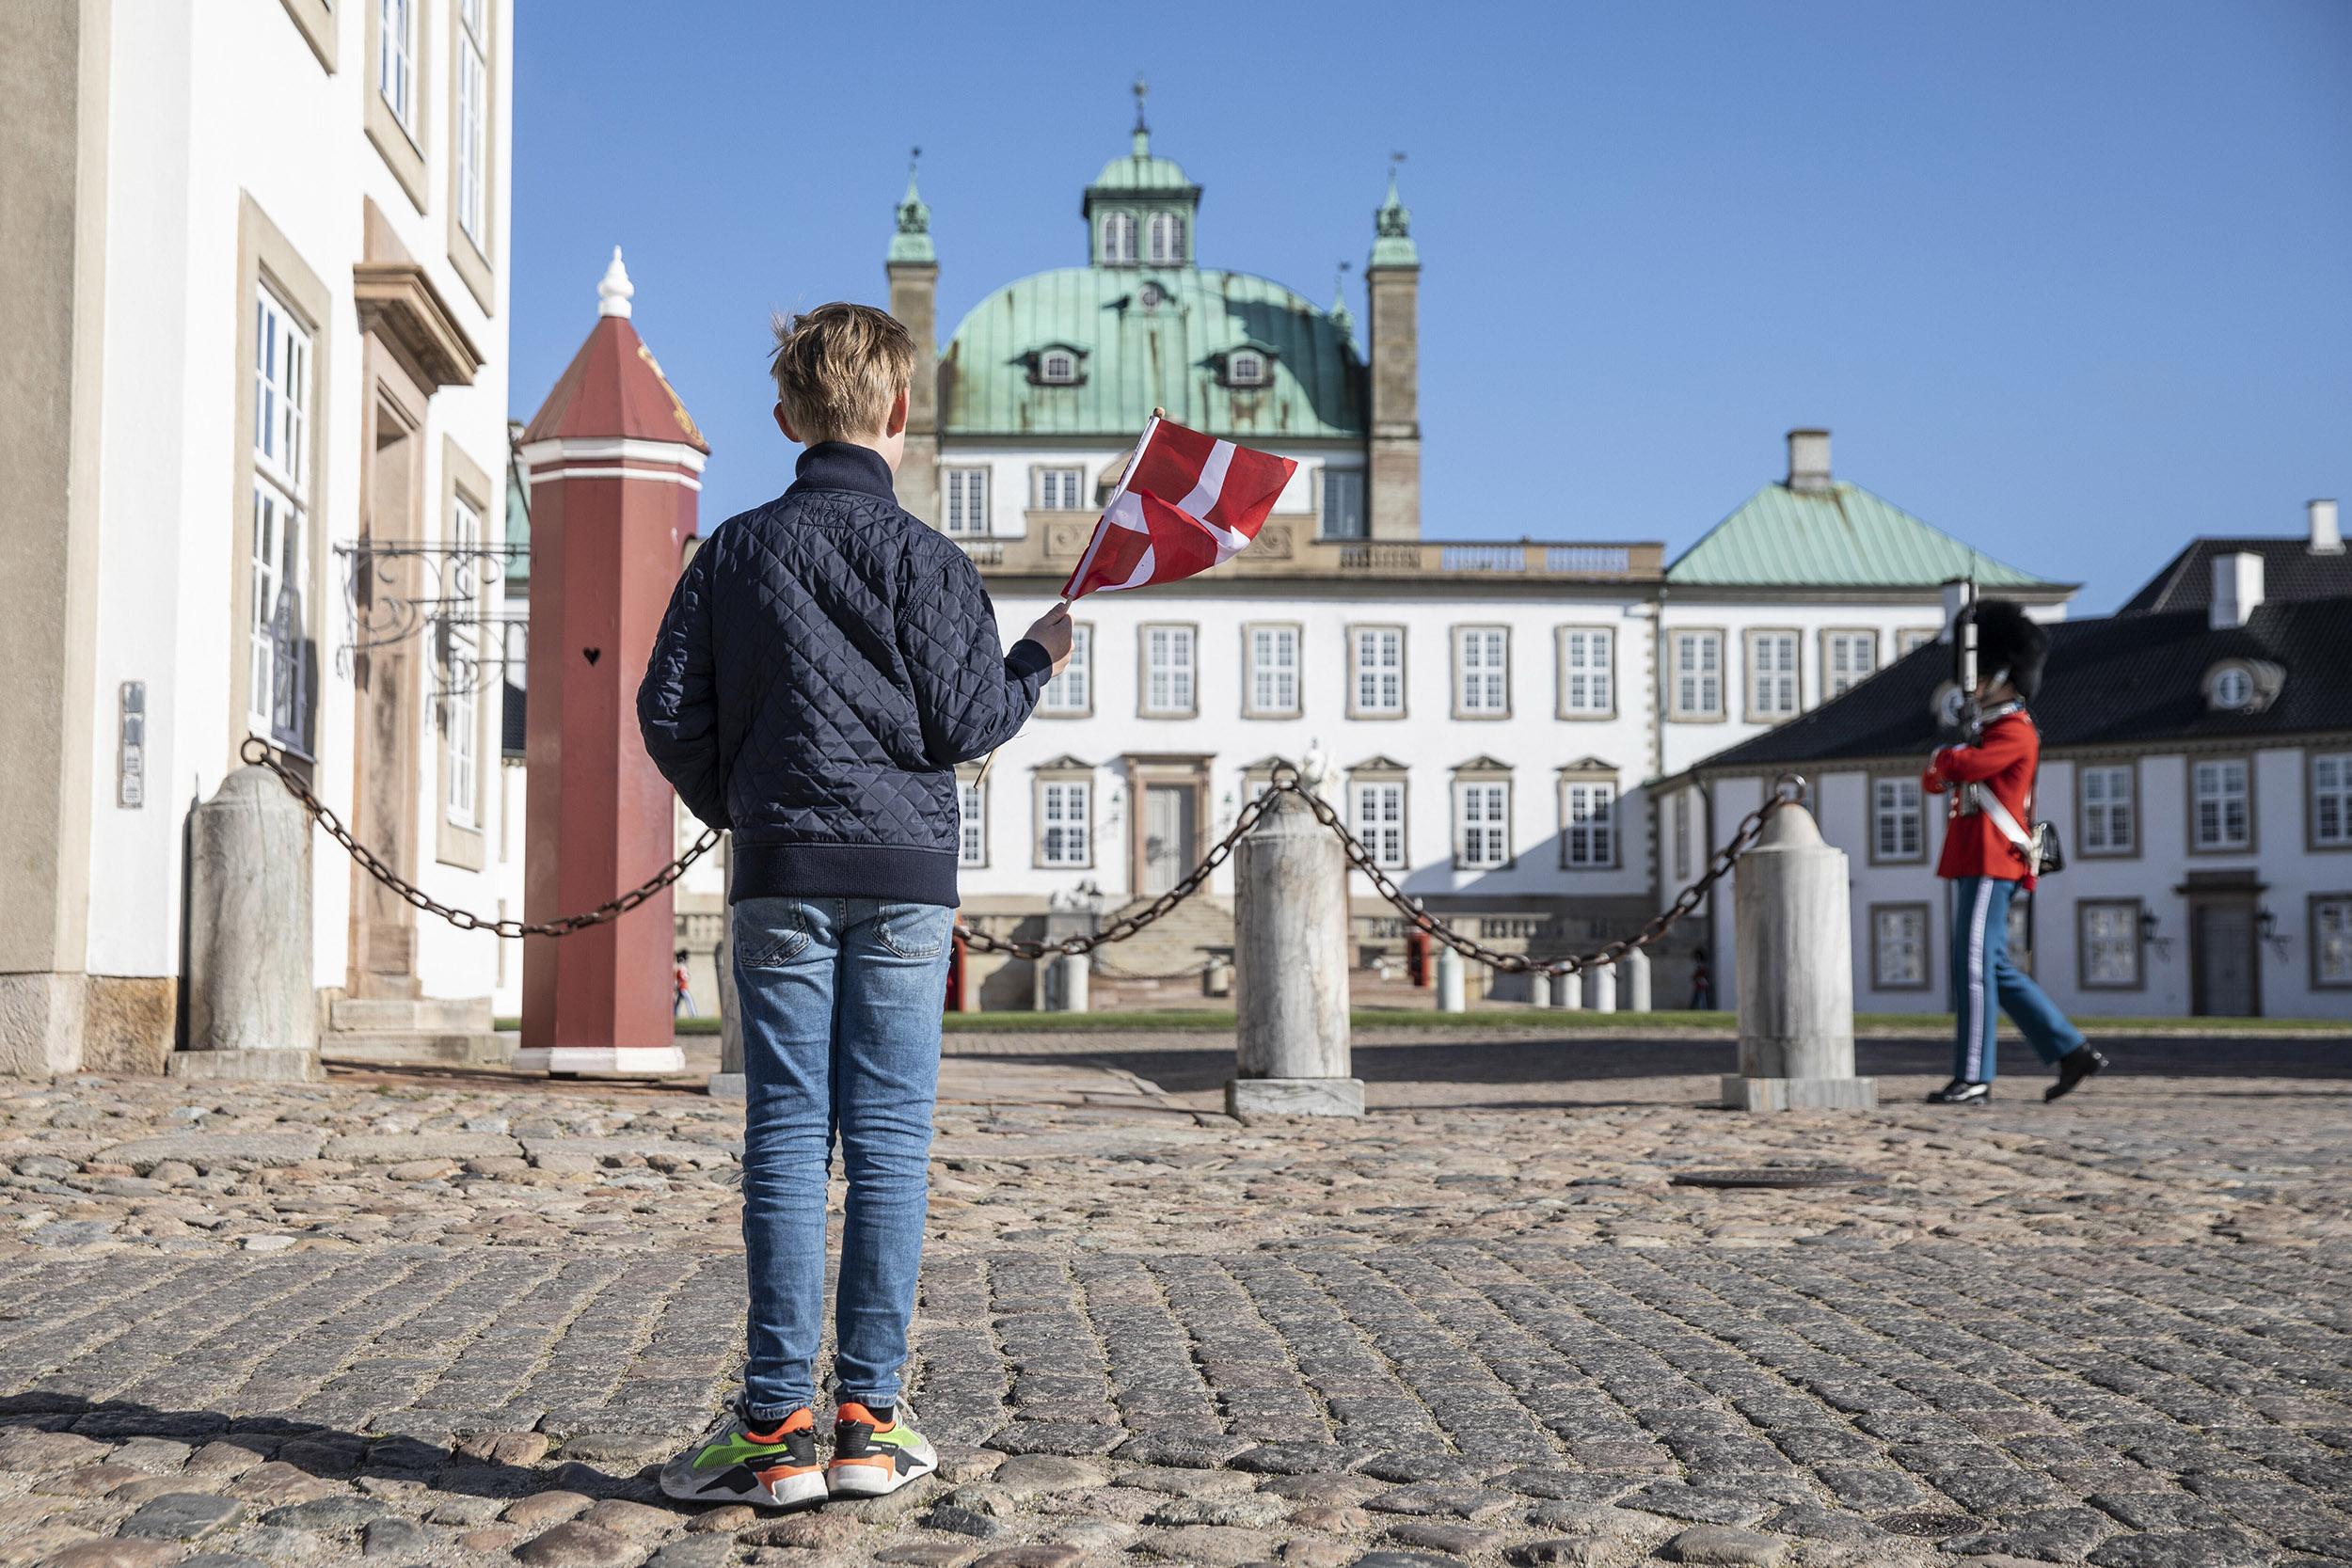 Europe prepares to lift lockdowns as coronavirus cases slow